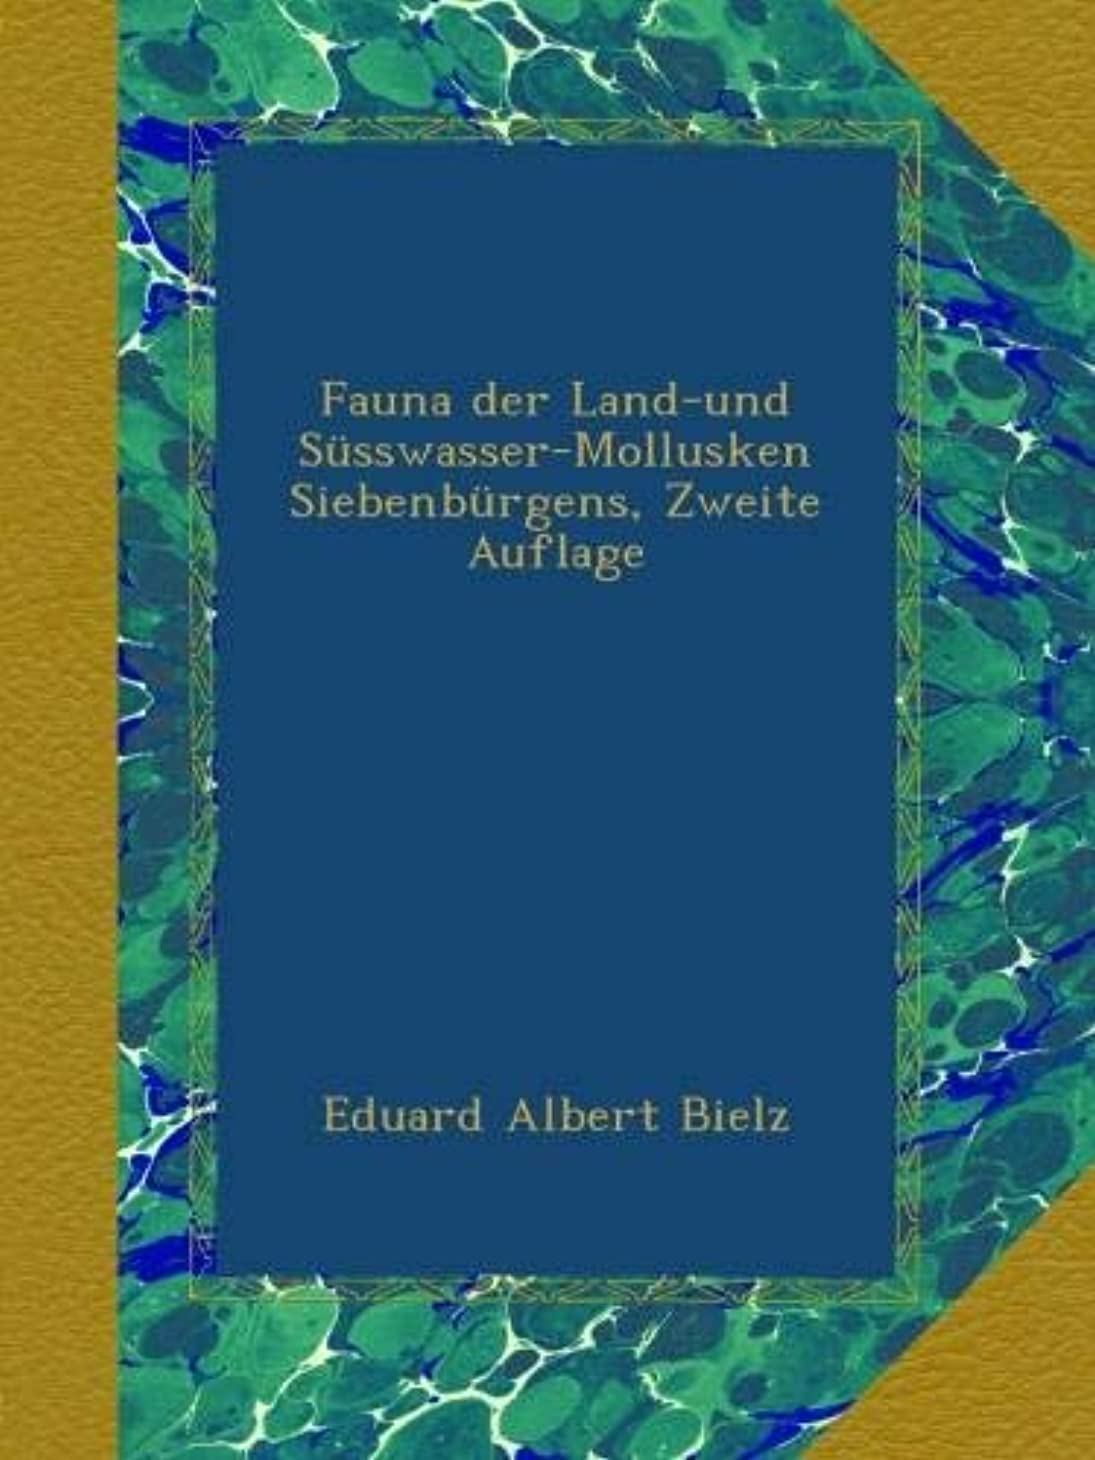 本土報告書静けさFauna der Land-und Suesswasser-Mollusken Siebenbuergens, Zweite Auflage